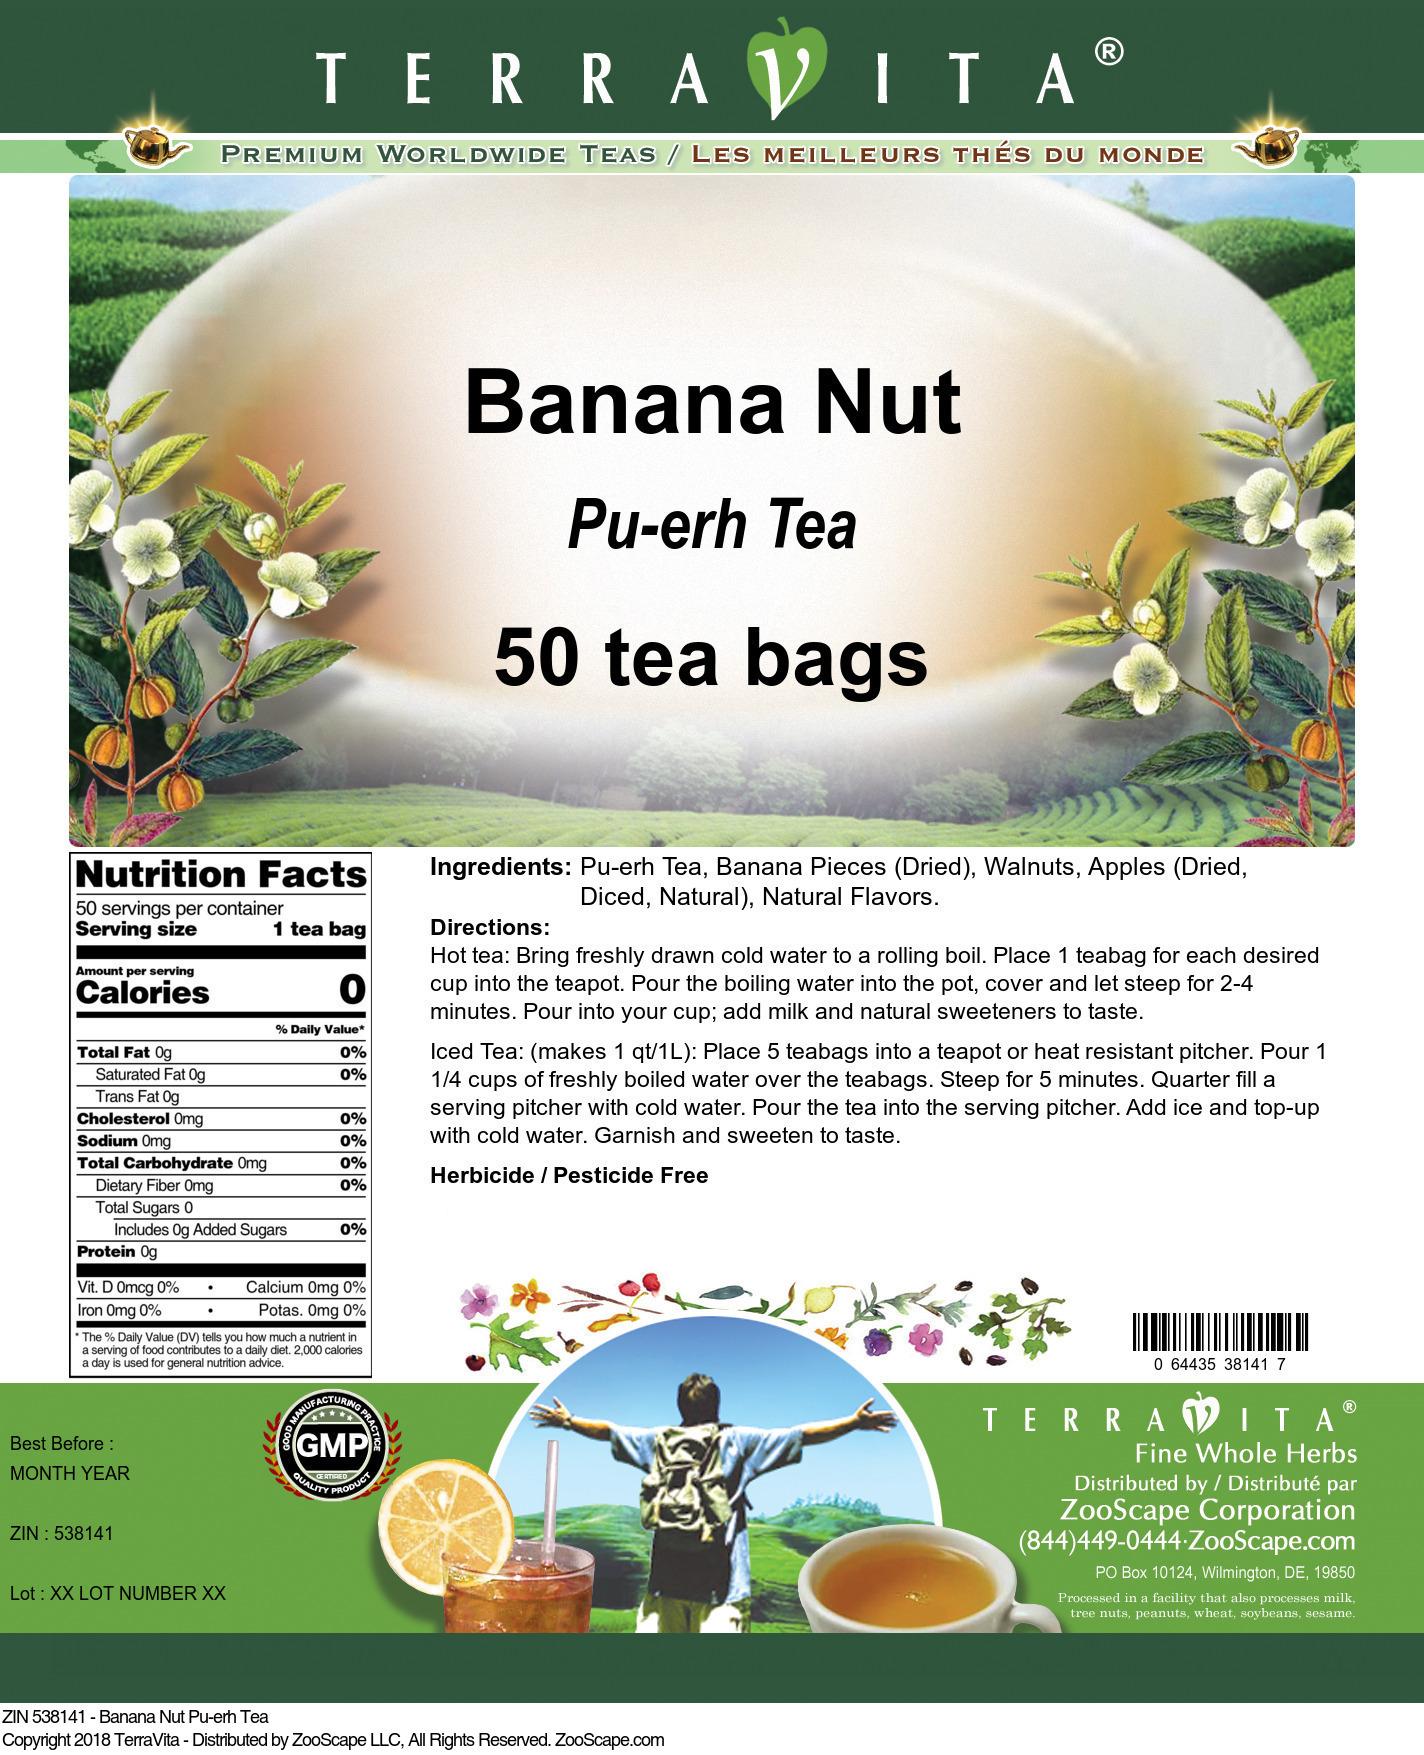 Banana Nut Pu-erh Tea